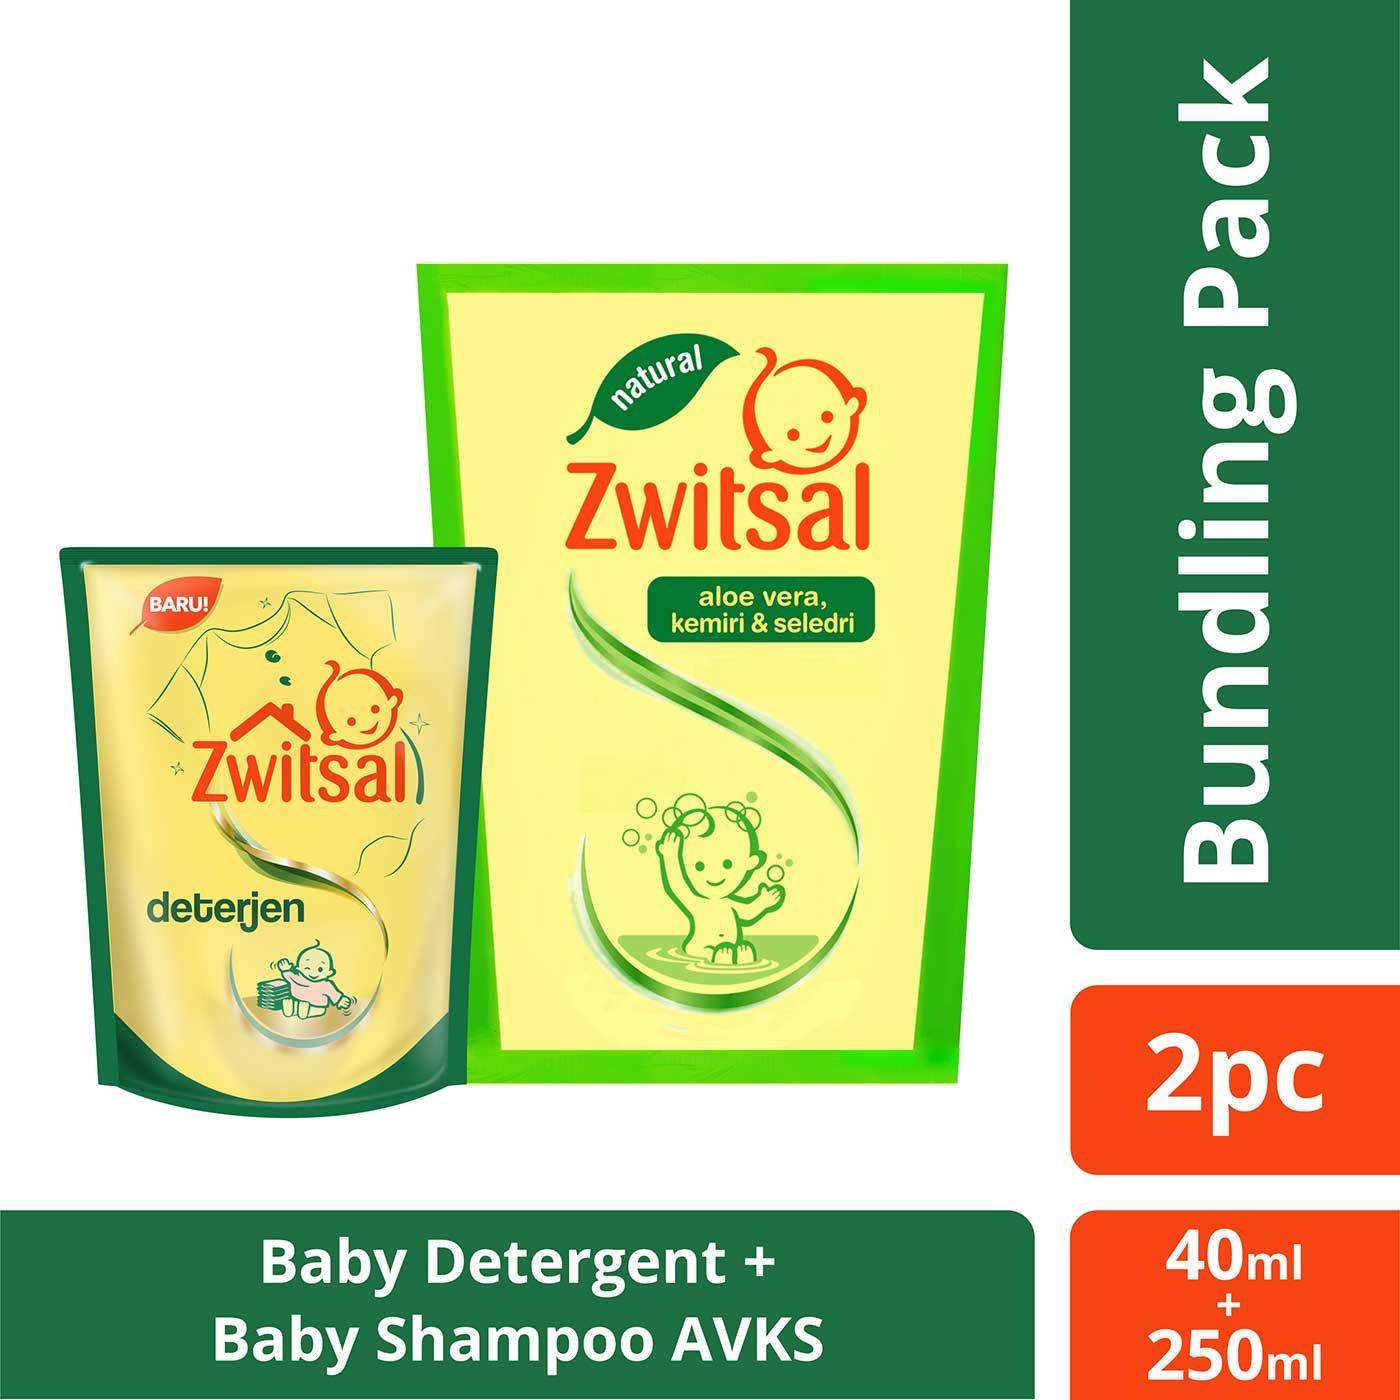 Zwitsal Baby Shampoo Aloe Vera Kemiri Seledri 250ml + Free Zwitsal Detergent 40ml